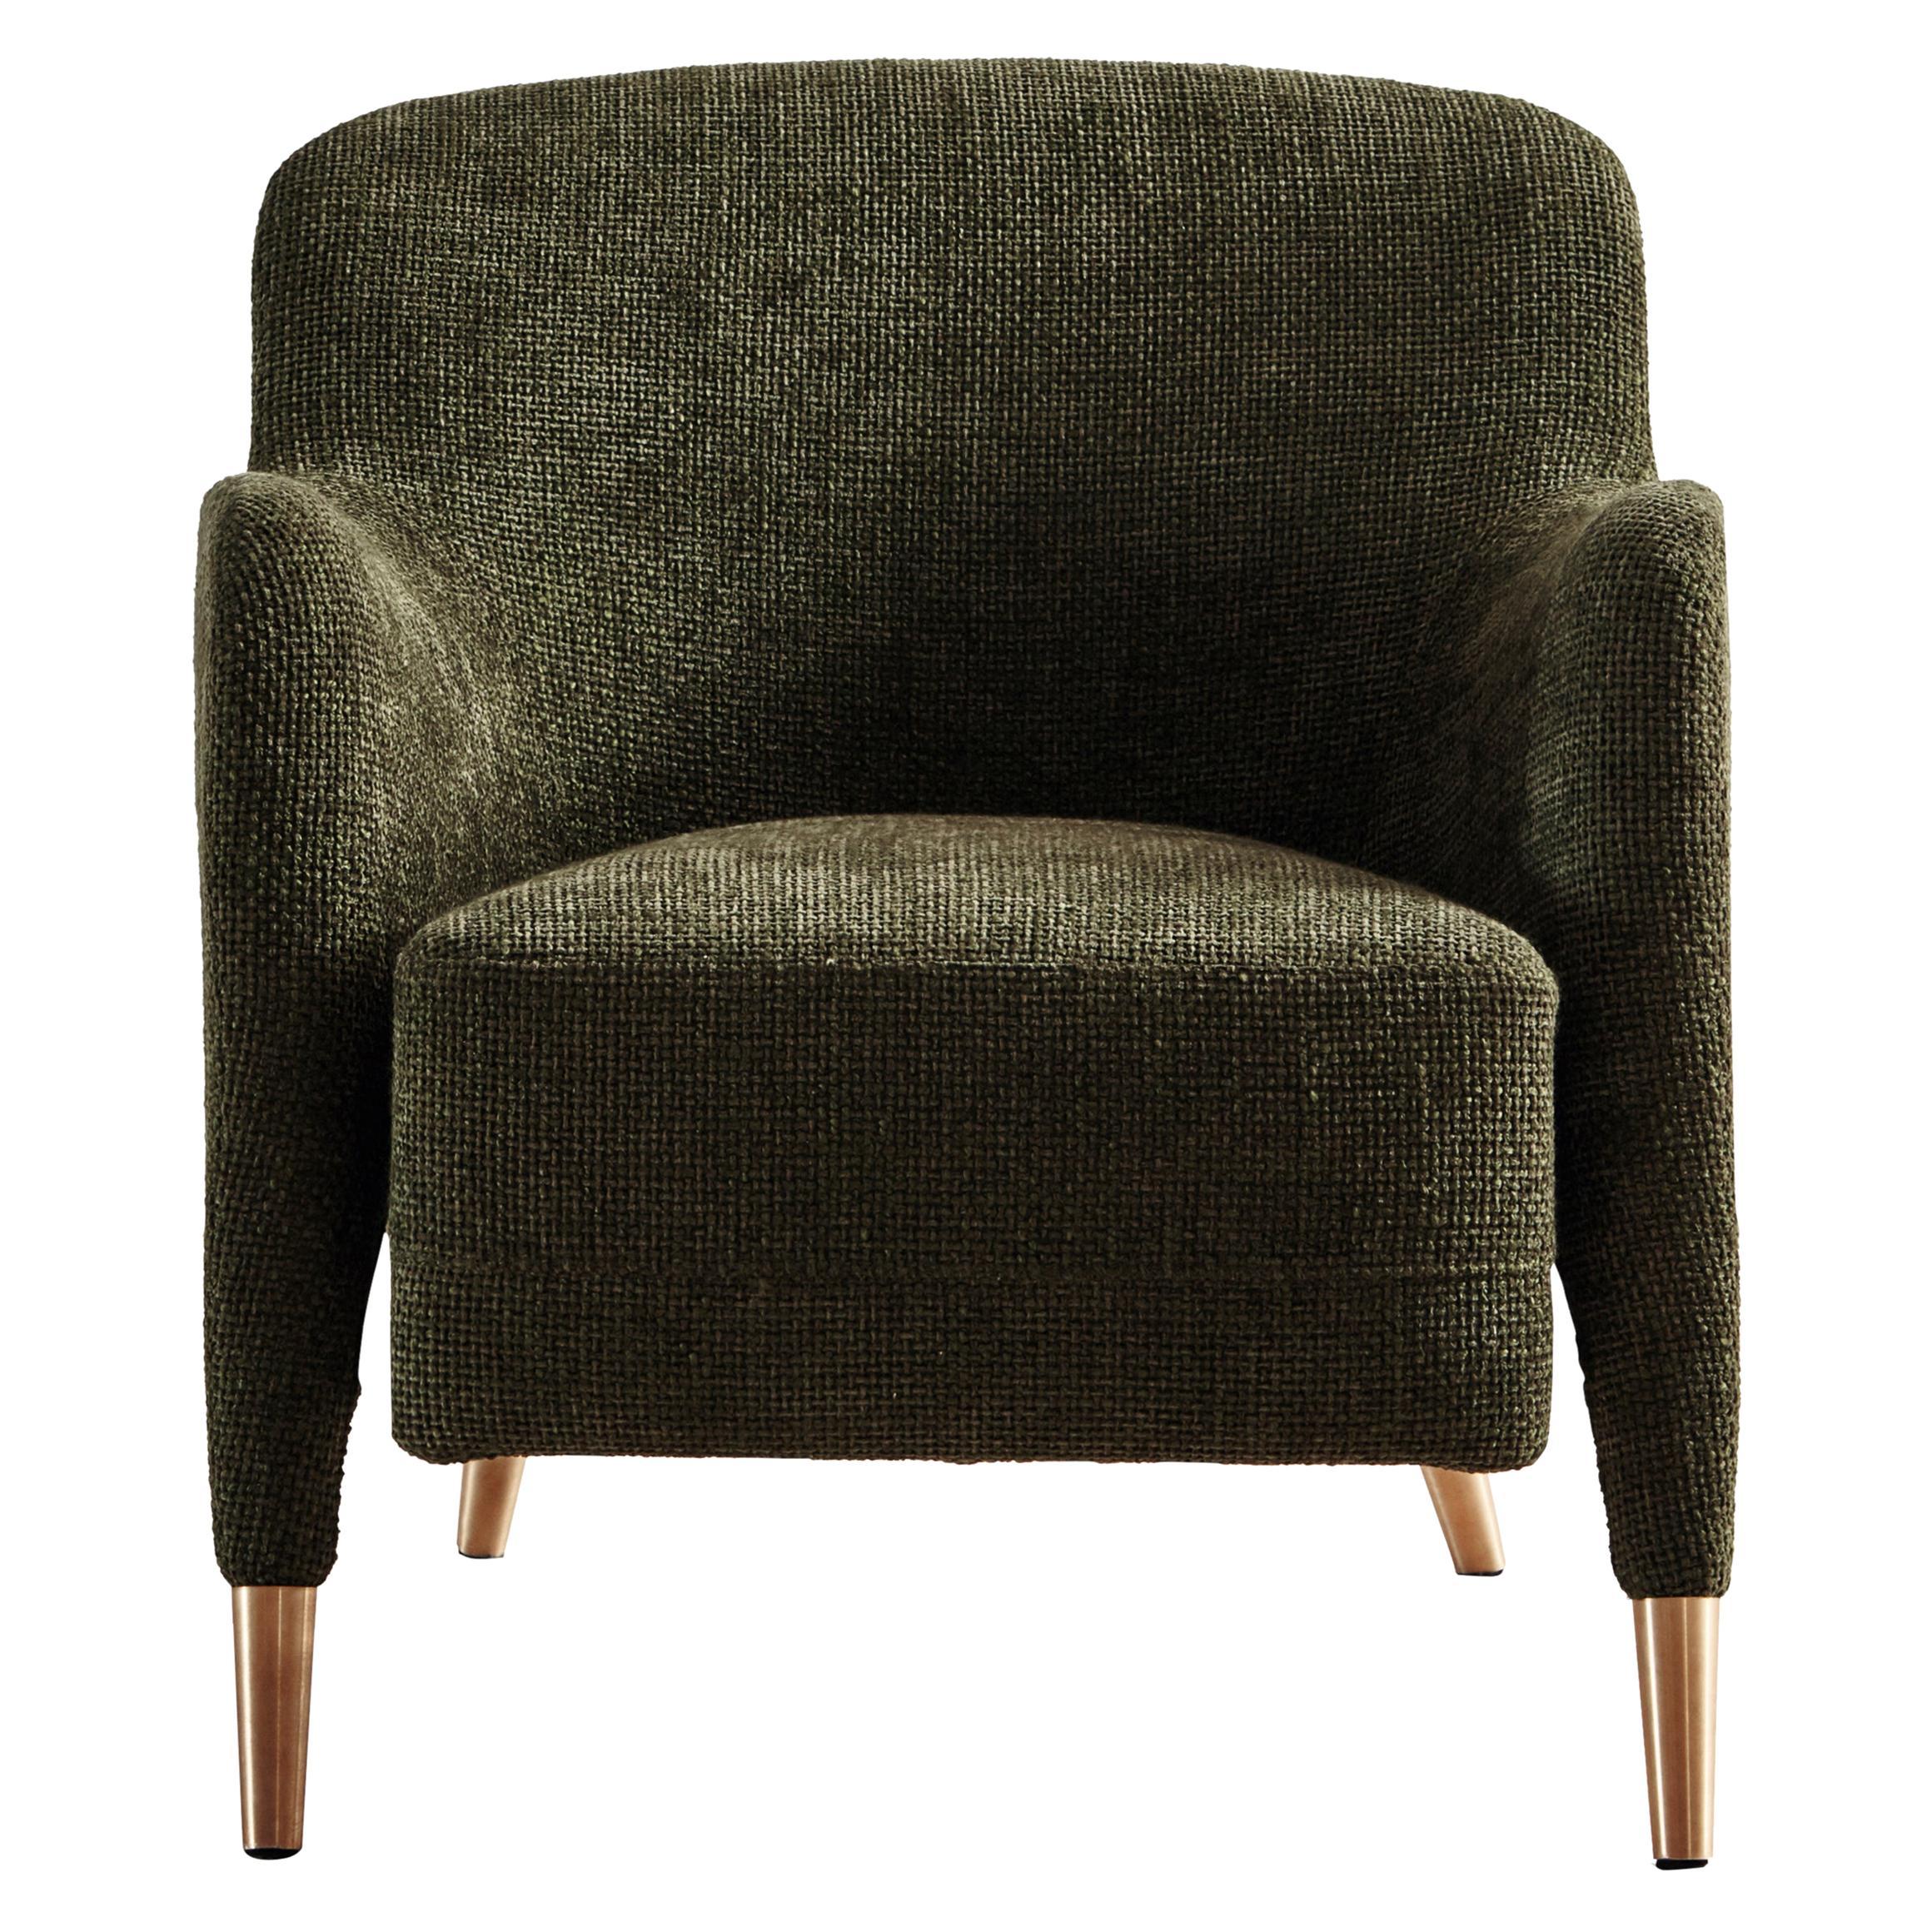 Molteni&C D.151.4 Armchair in Chenille Fabric by Gio Ponti